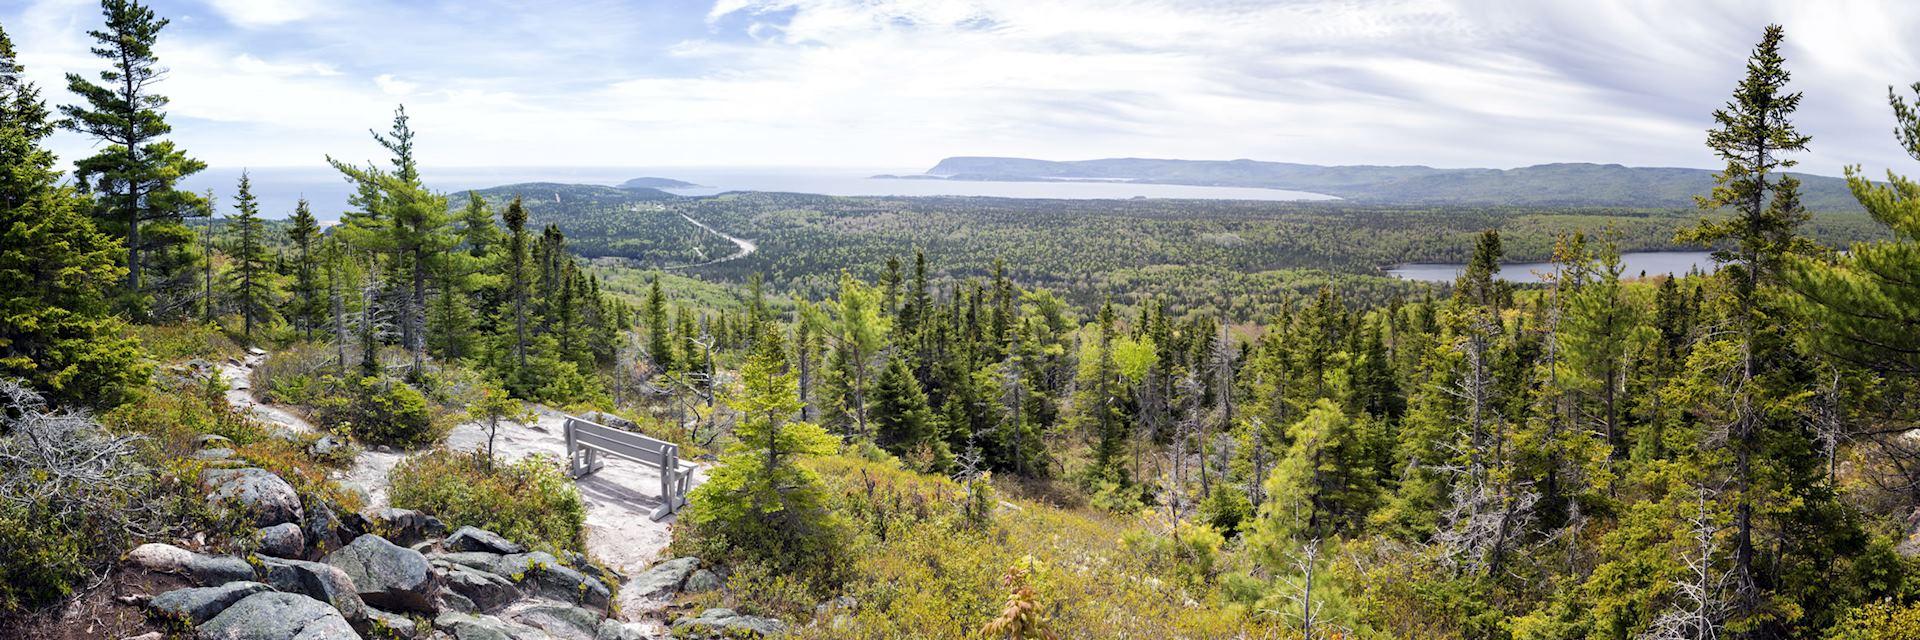 Broadcove Mountain, Cape Breton